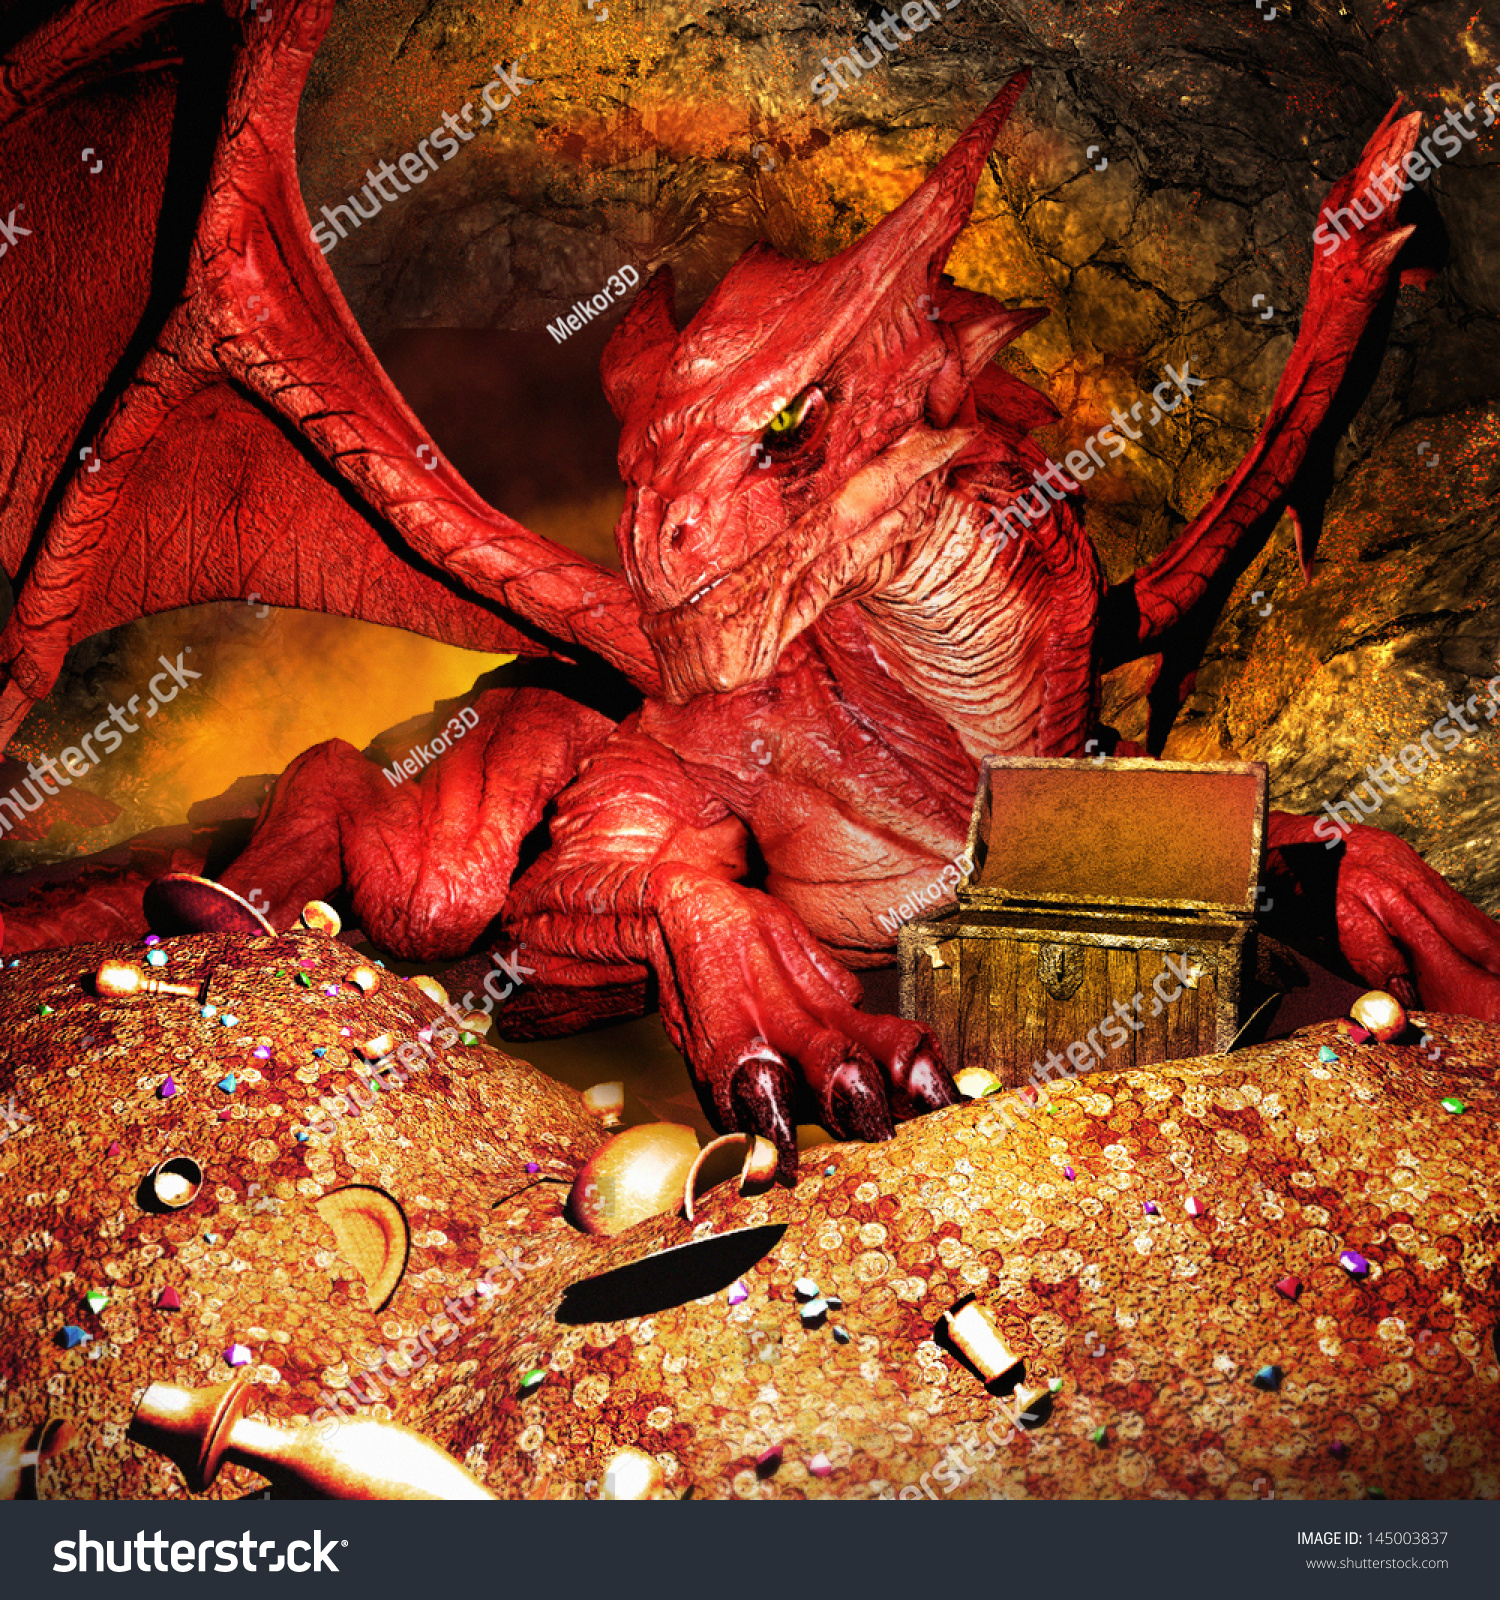 red dragon guarding treasure stock illustration 145003837